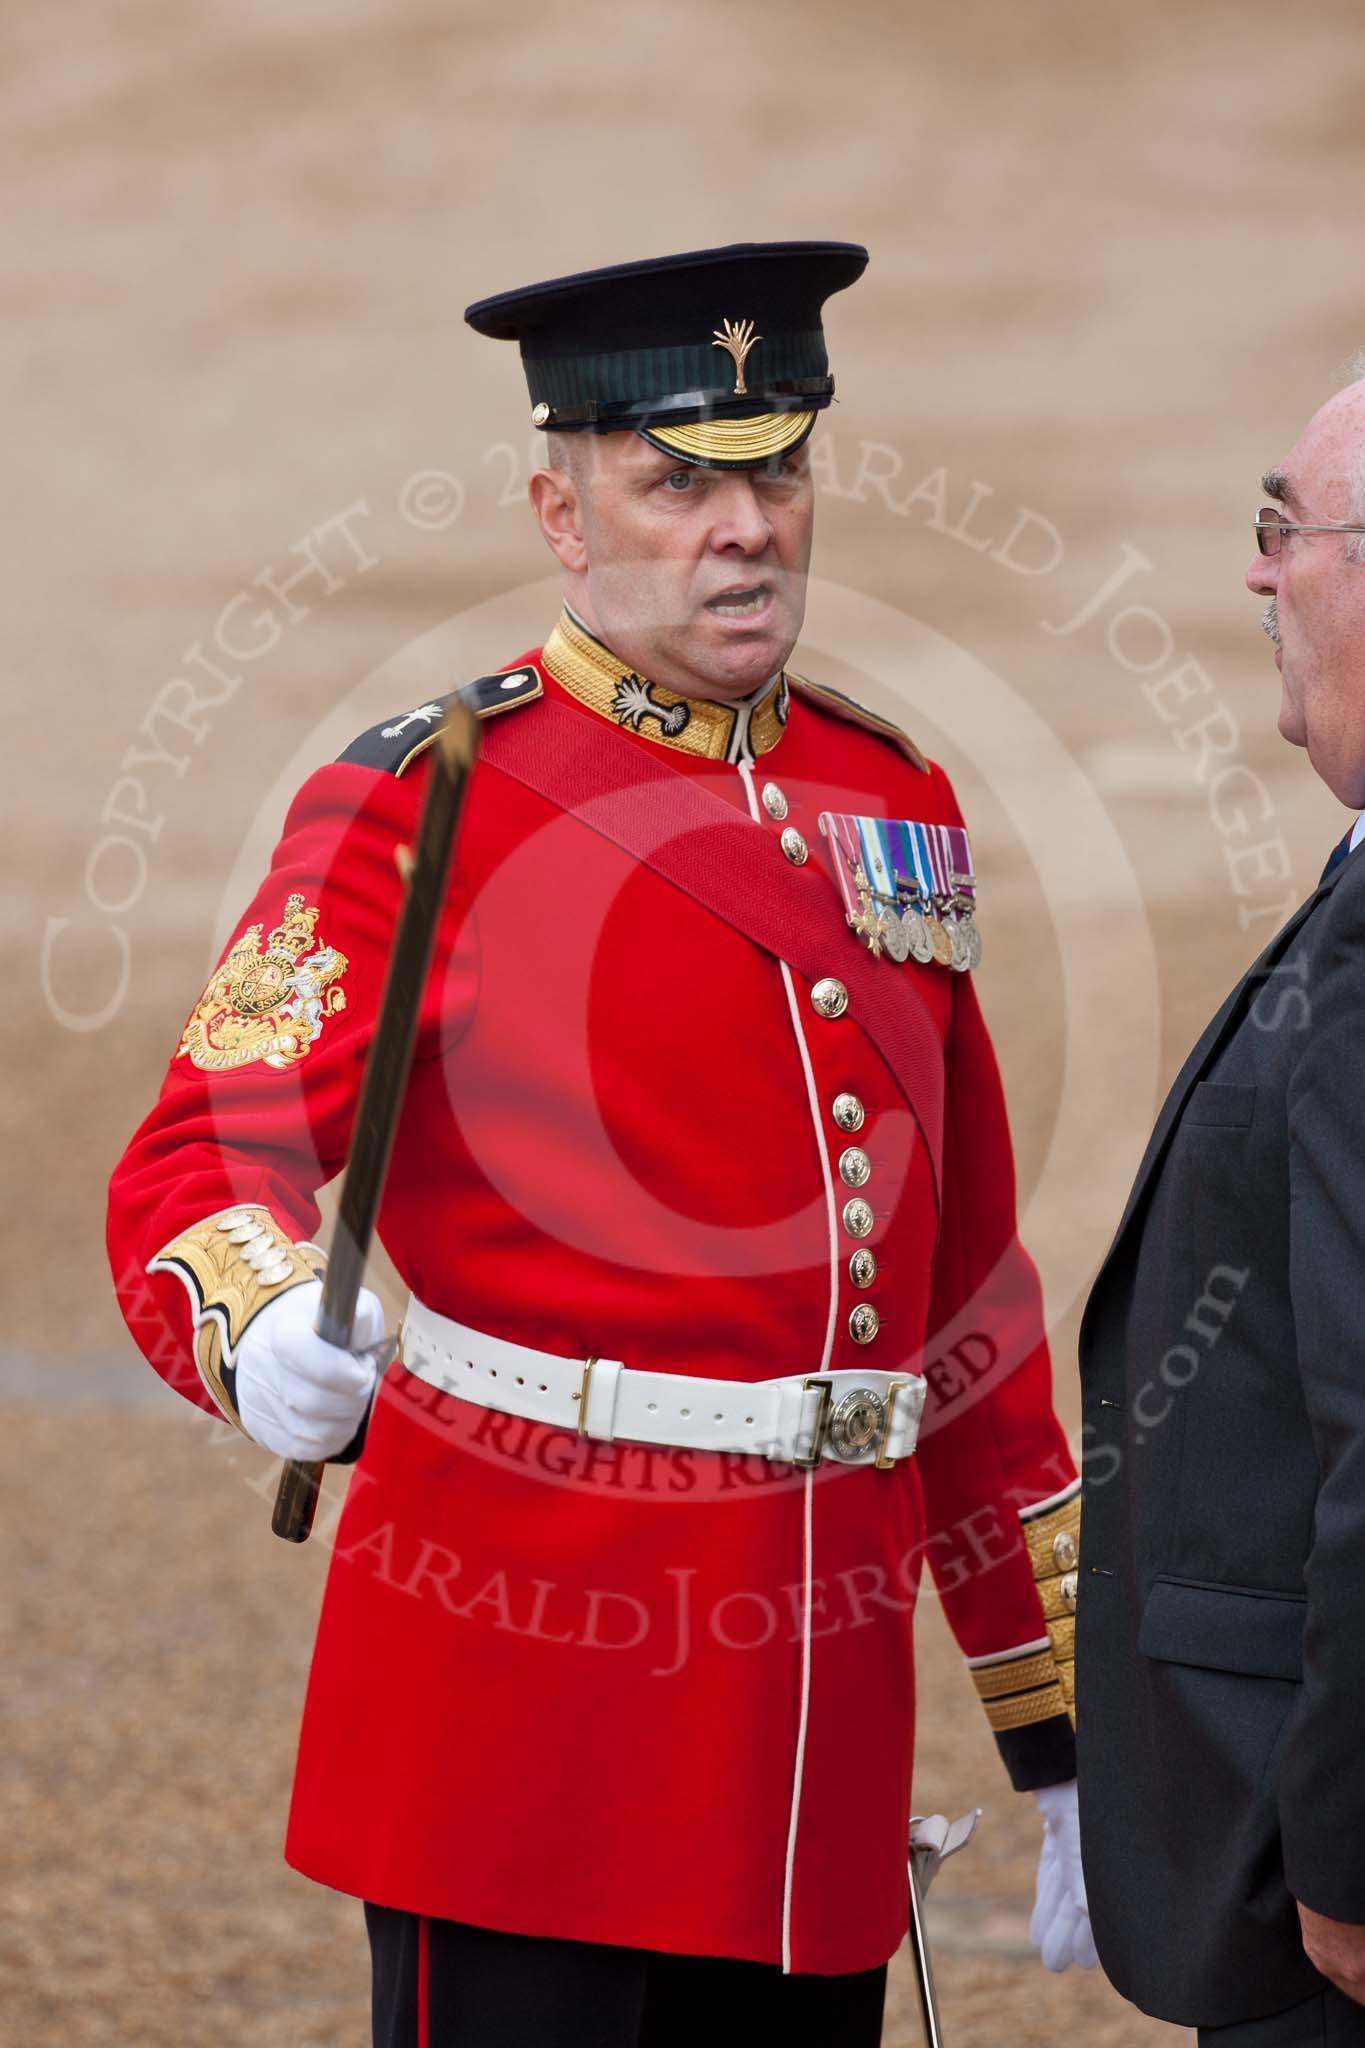 Master Sergeant Roof Chief Master Sergeant Brian K